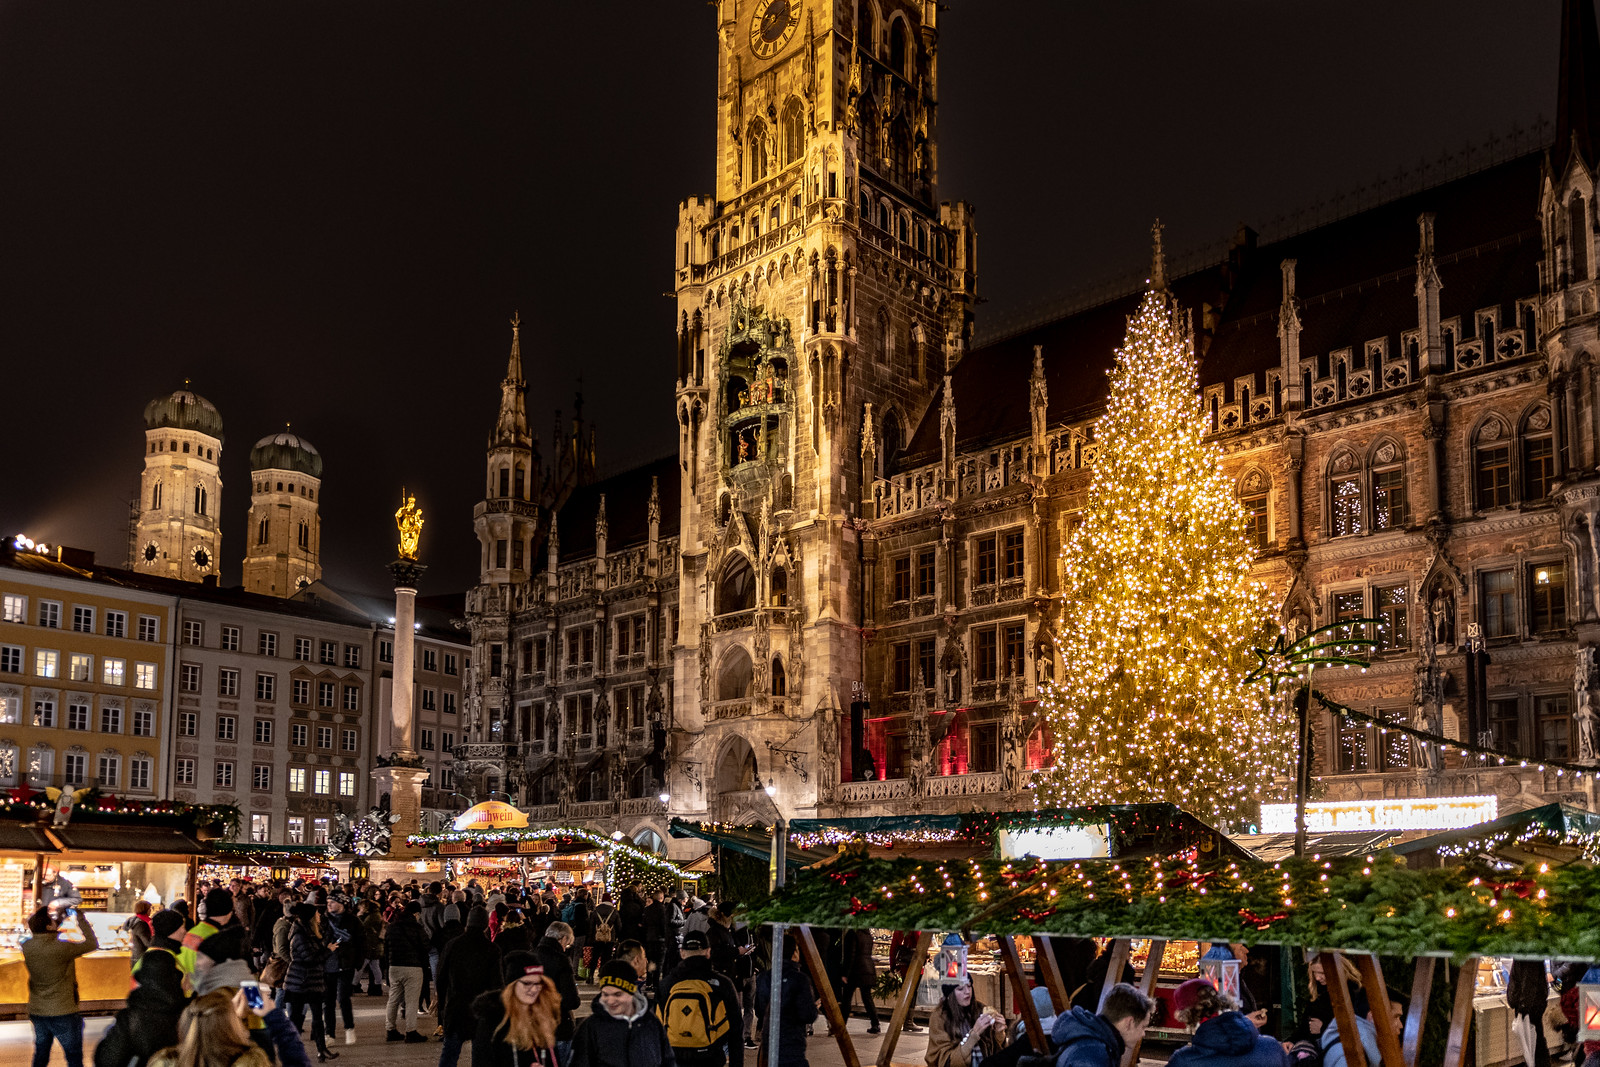 【Triplisher玩樂報】此生必感受的聖誕節氣氛|德國聖誕市集懶人包 | Triplisher Stories